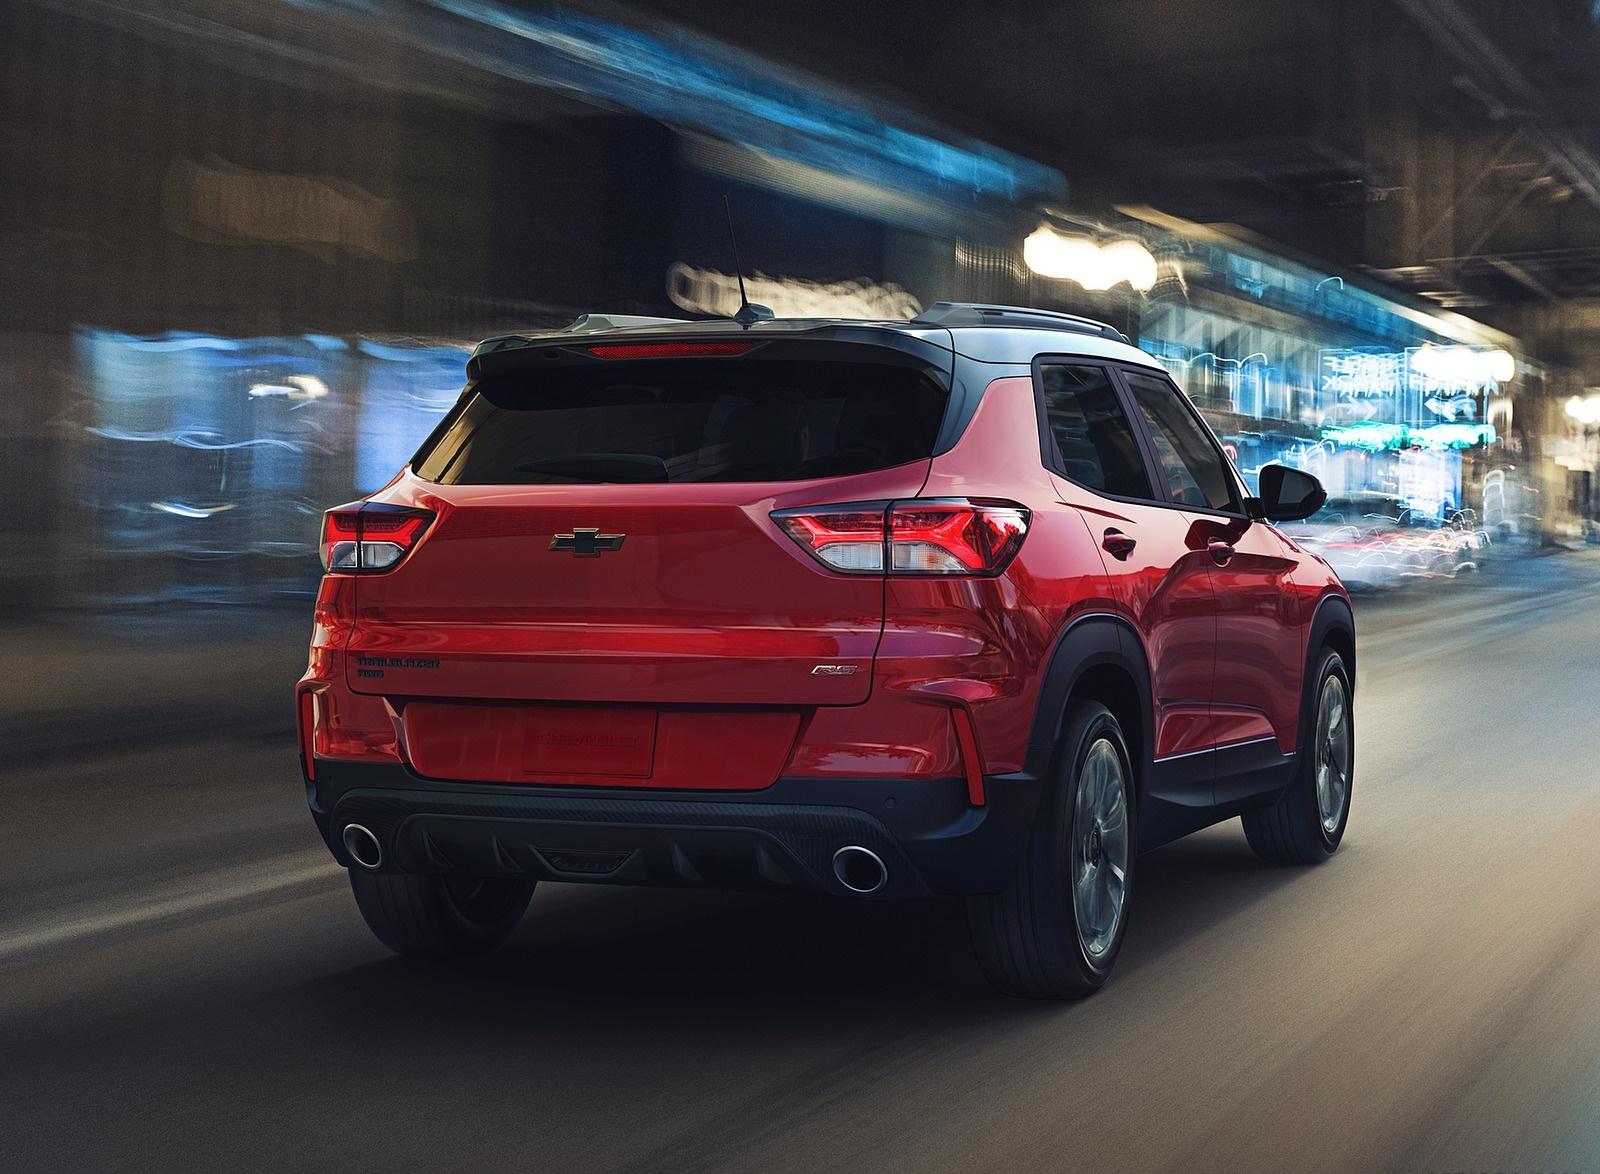 2021 Chevrolet Trailblazer RS Rear Wallpapers (2)